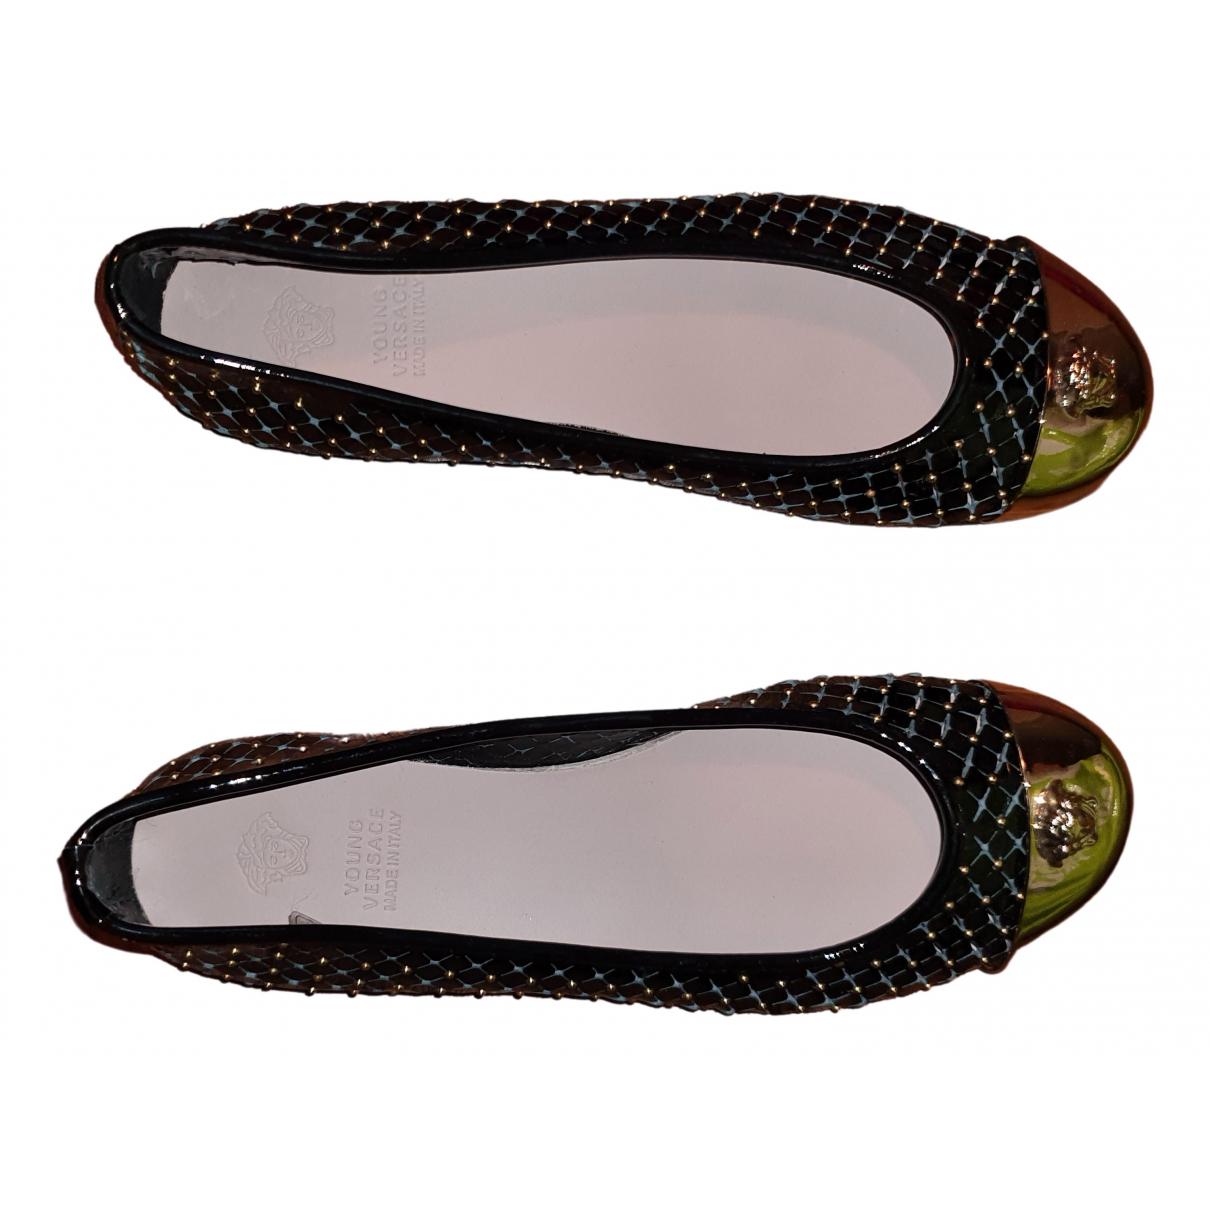 Versace \N Black Patent leather Ballet flats for Women 38 EU